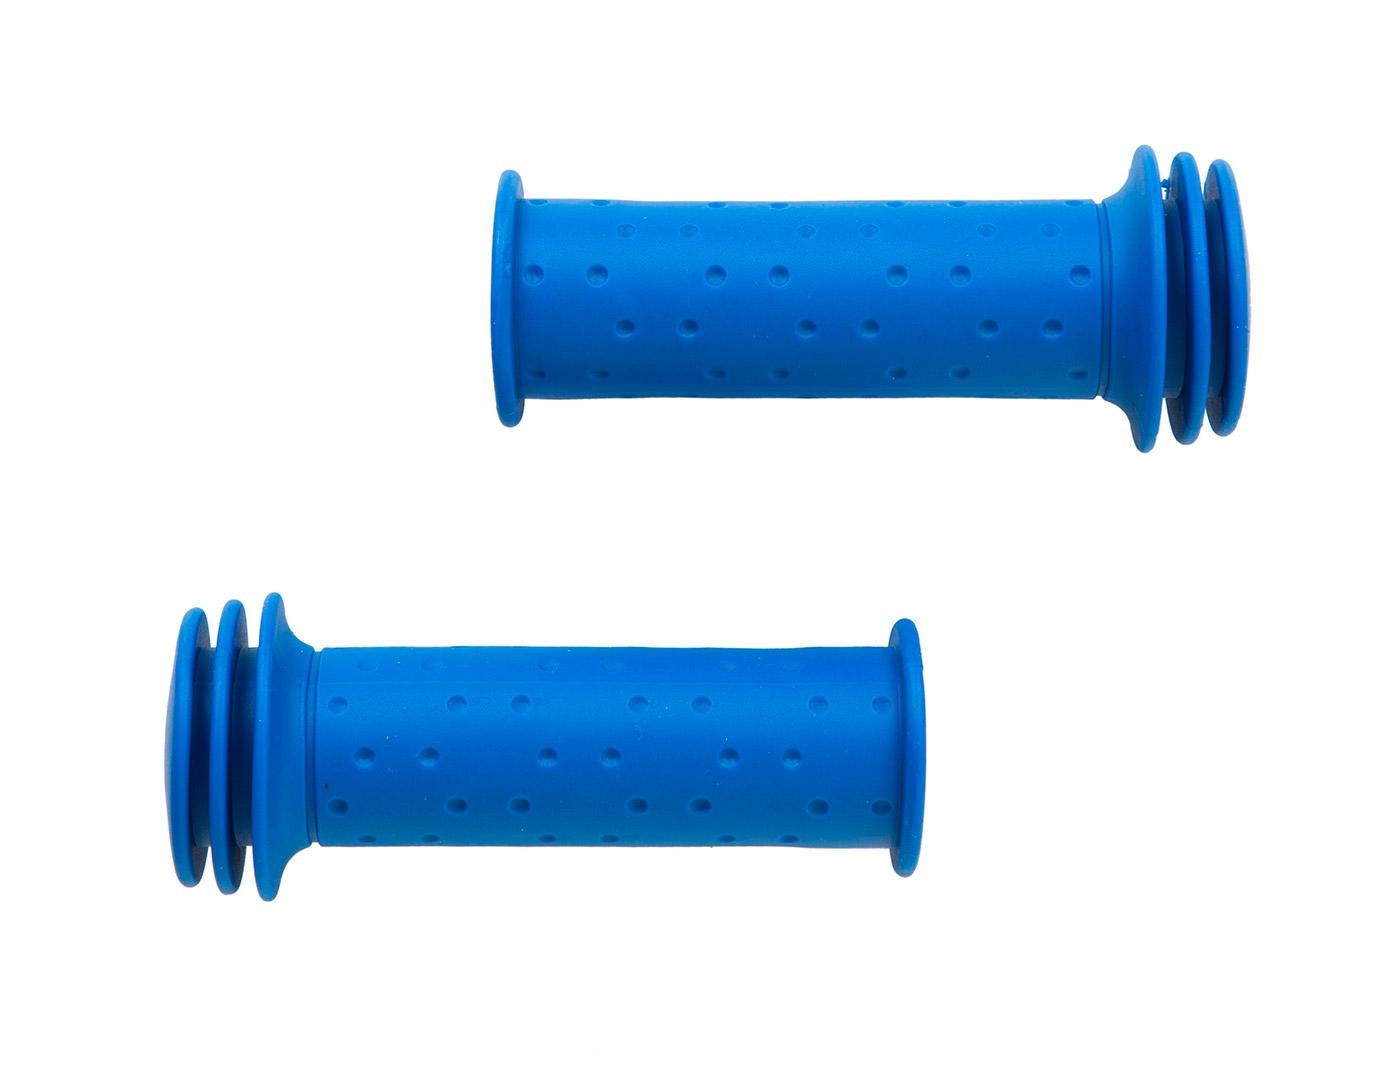 Грипсы Green Cycle GC-G96 102mm детские, синие